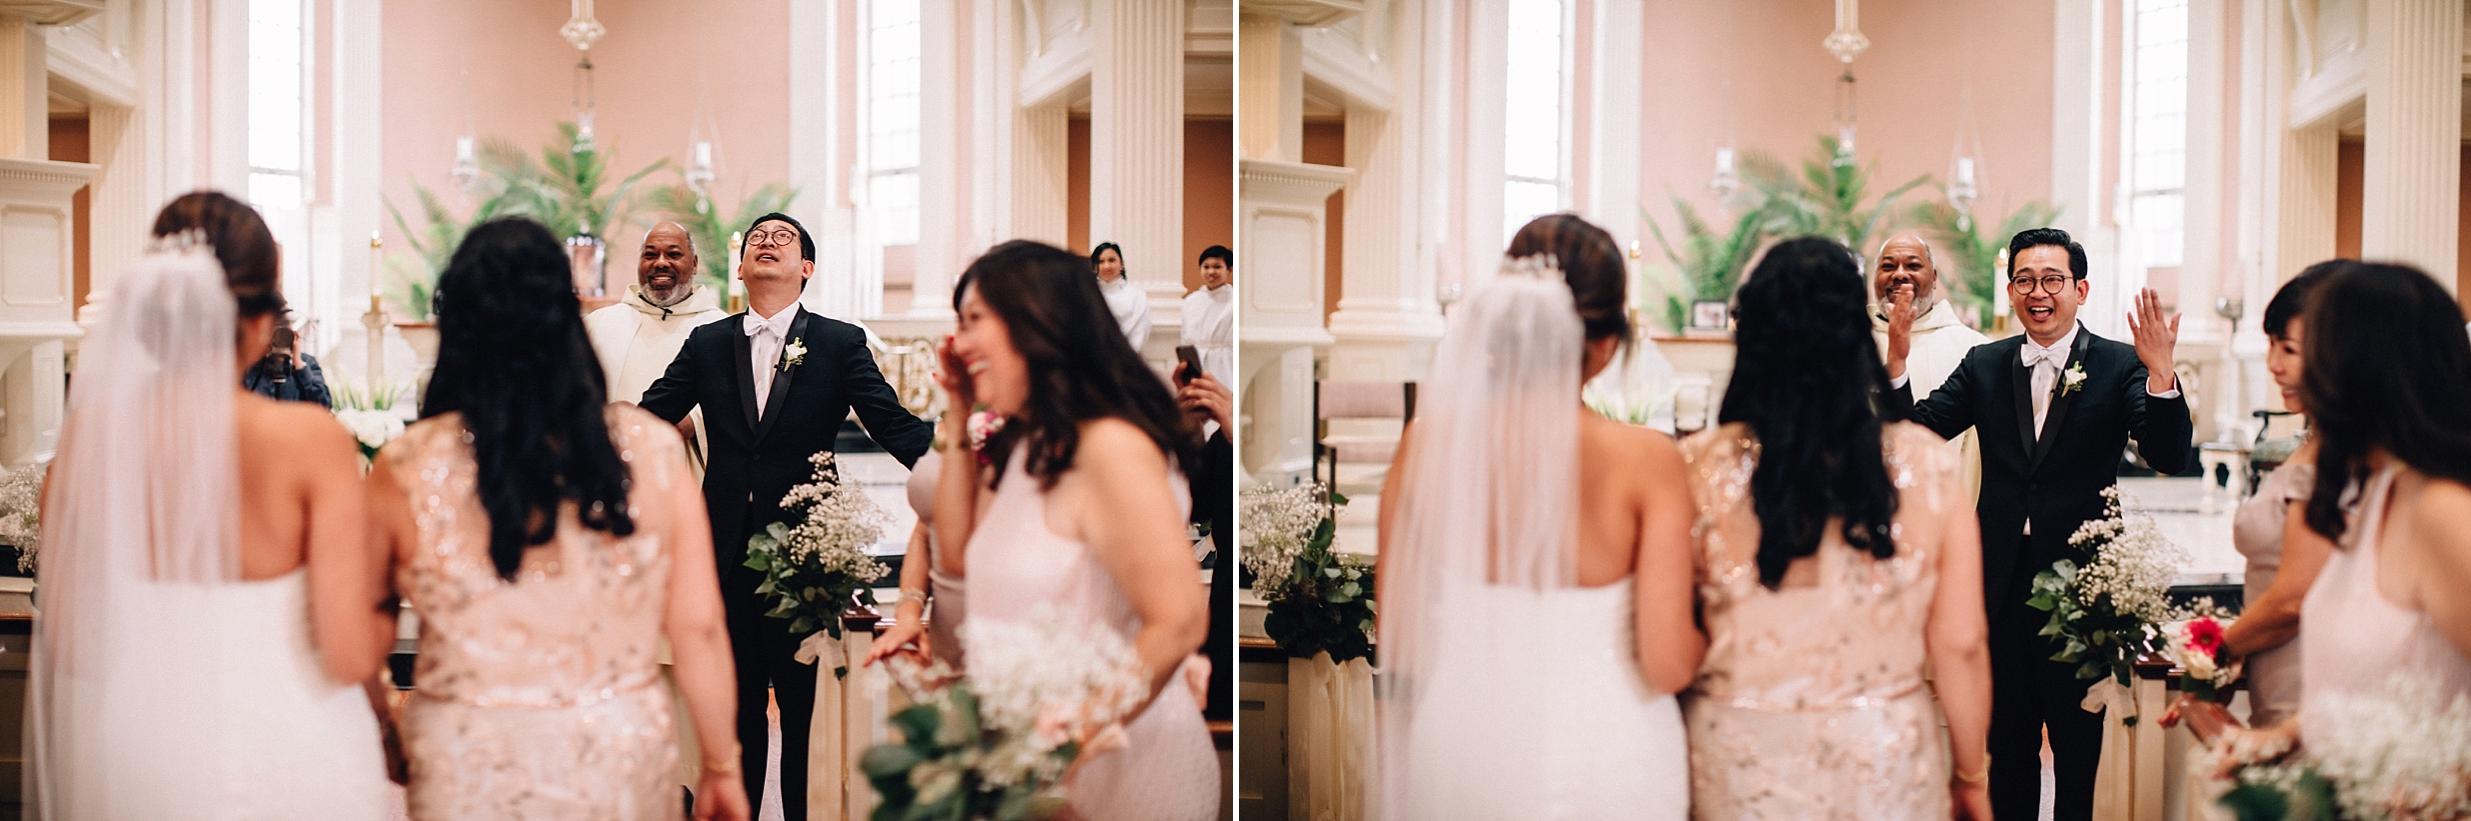 crossed-keys-estate-filipino-wedding-nj_0087.jpg